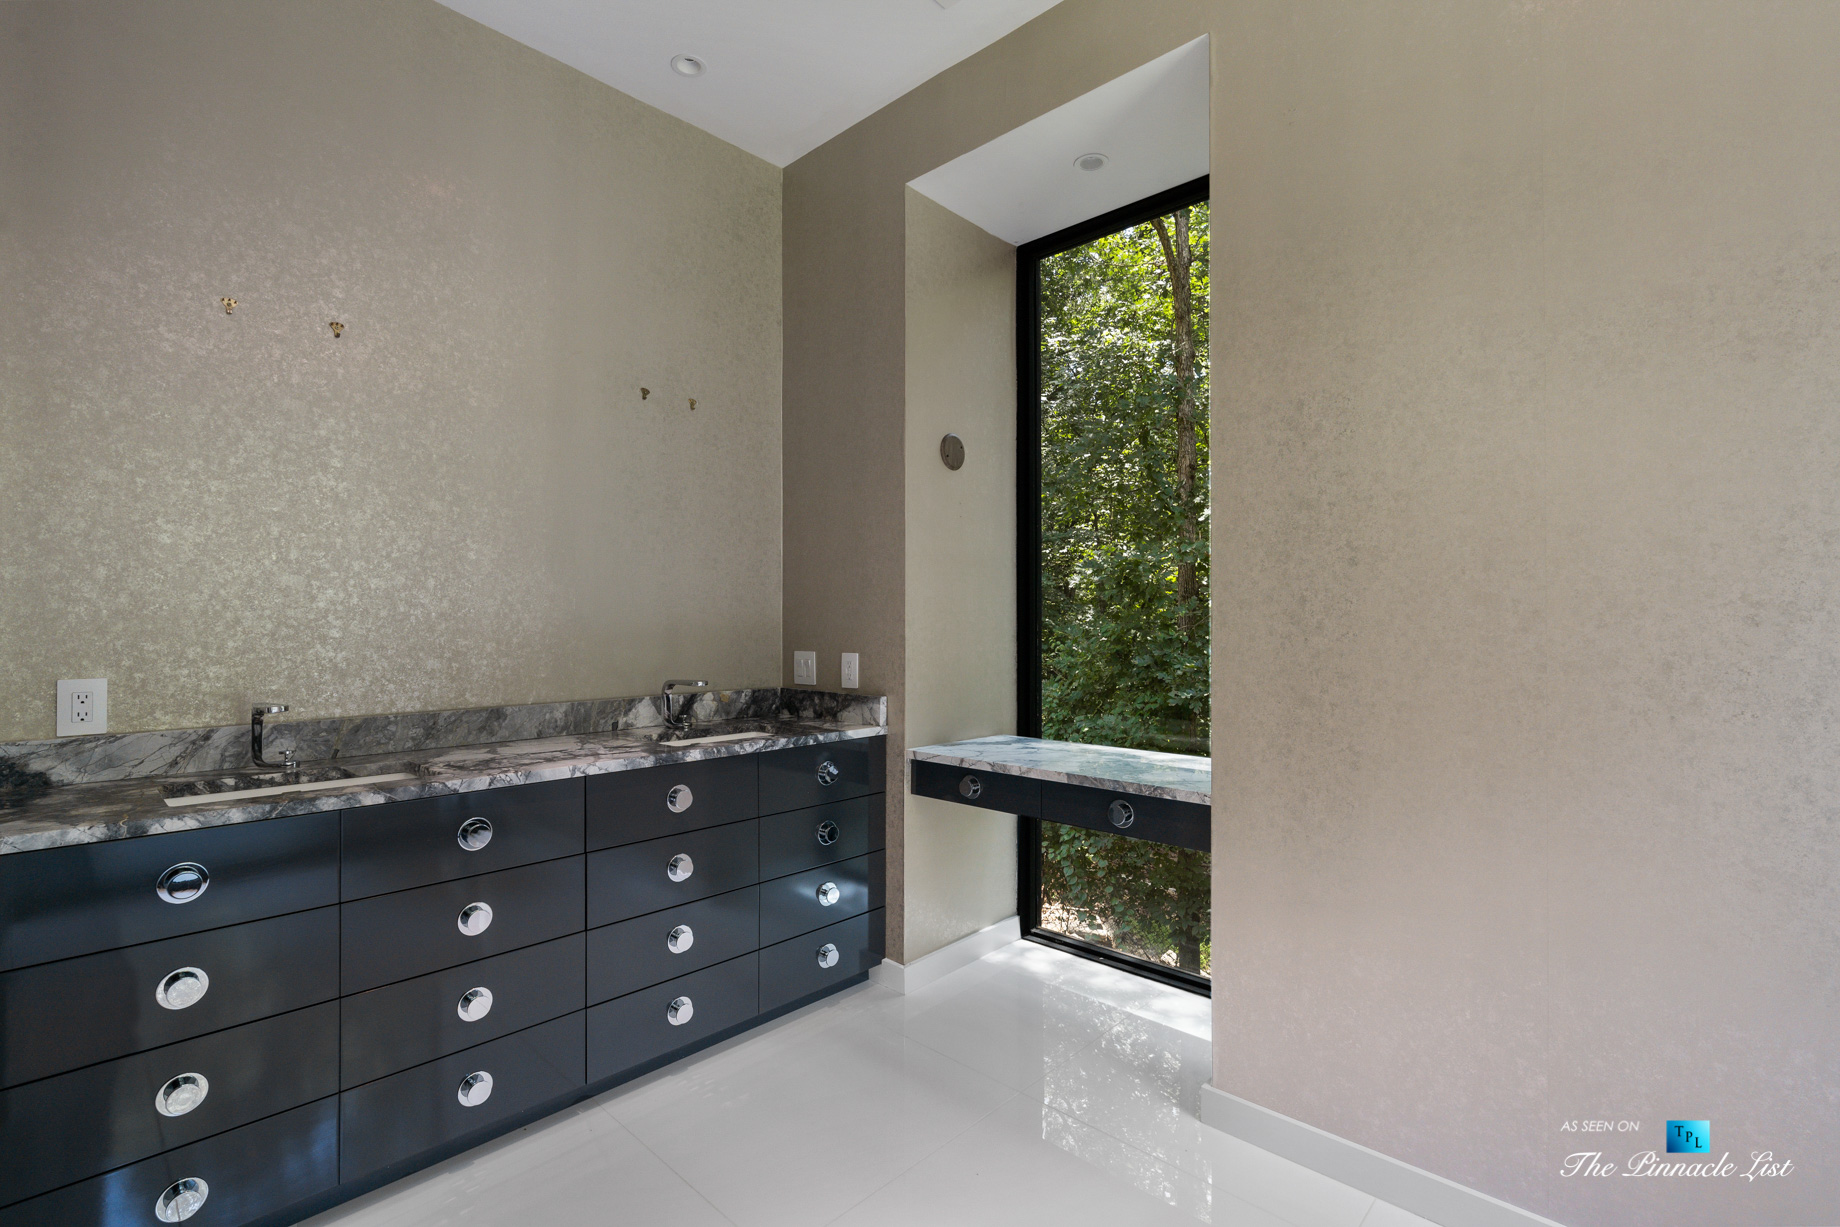 2716 Ridgewood Rd NW, Atlanta, GA, USA - Master Bathroom - Luxury Real Estate - Modern Contemporary Buckhead Home